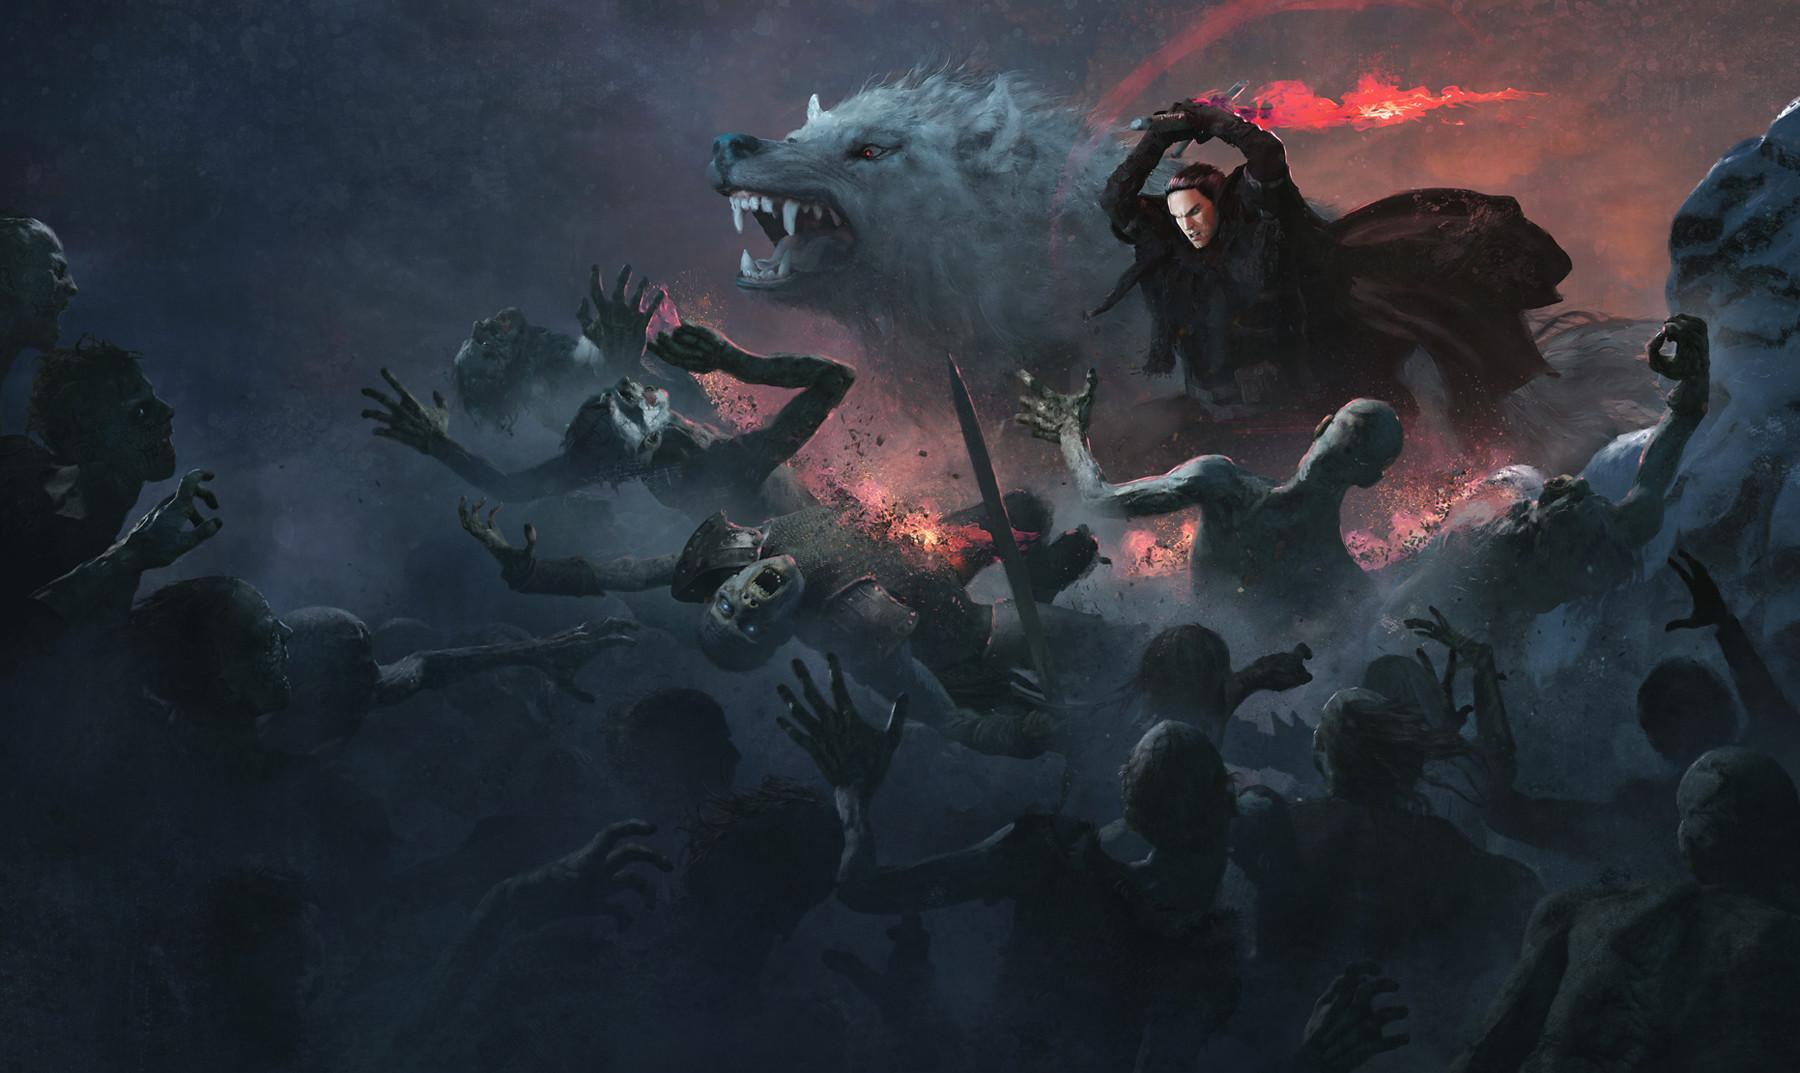 Jon Snow with Azor Ahai Sword (GuillemH. Pongiluppi)